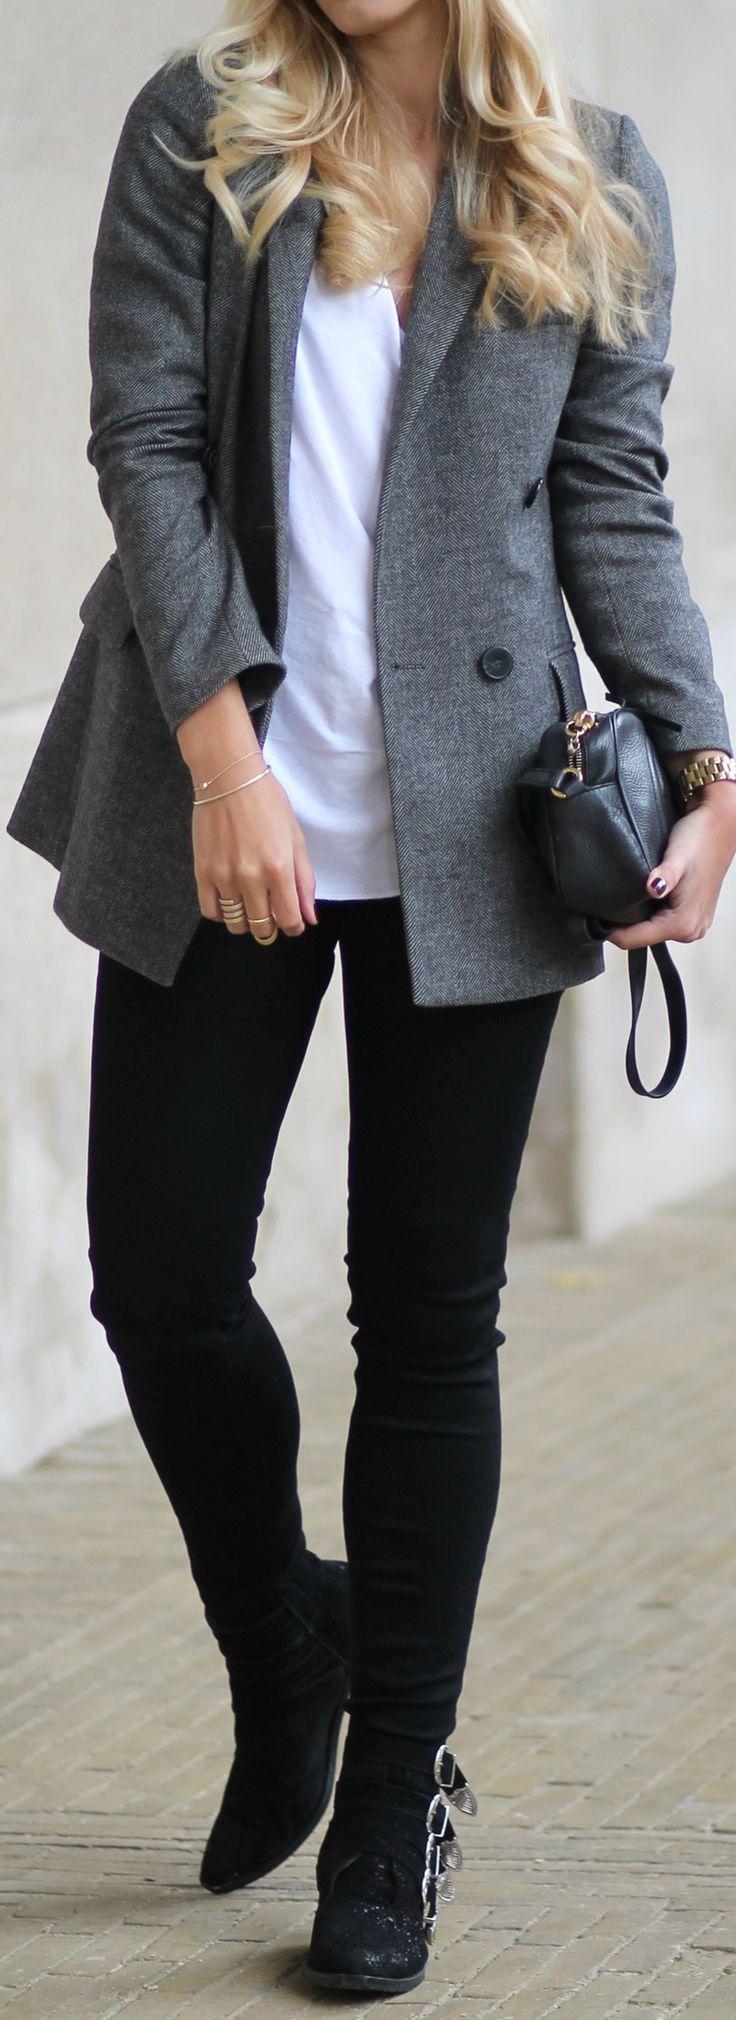 Blazer: Zara // T-shirt: Asos // Jeans: Asos // Boots: Toga Pulla // Bag: Gucci 'Soho Disco'